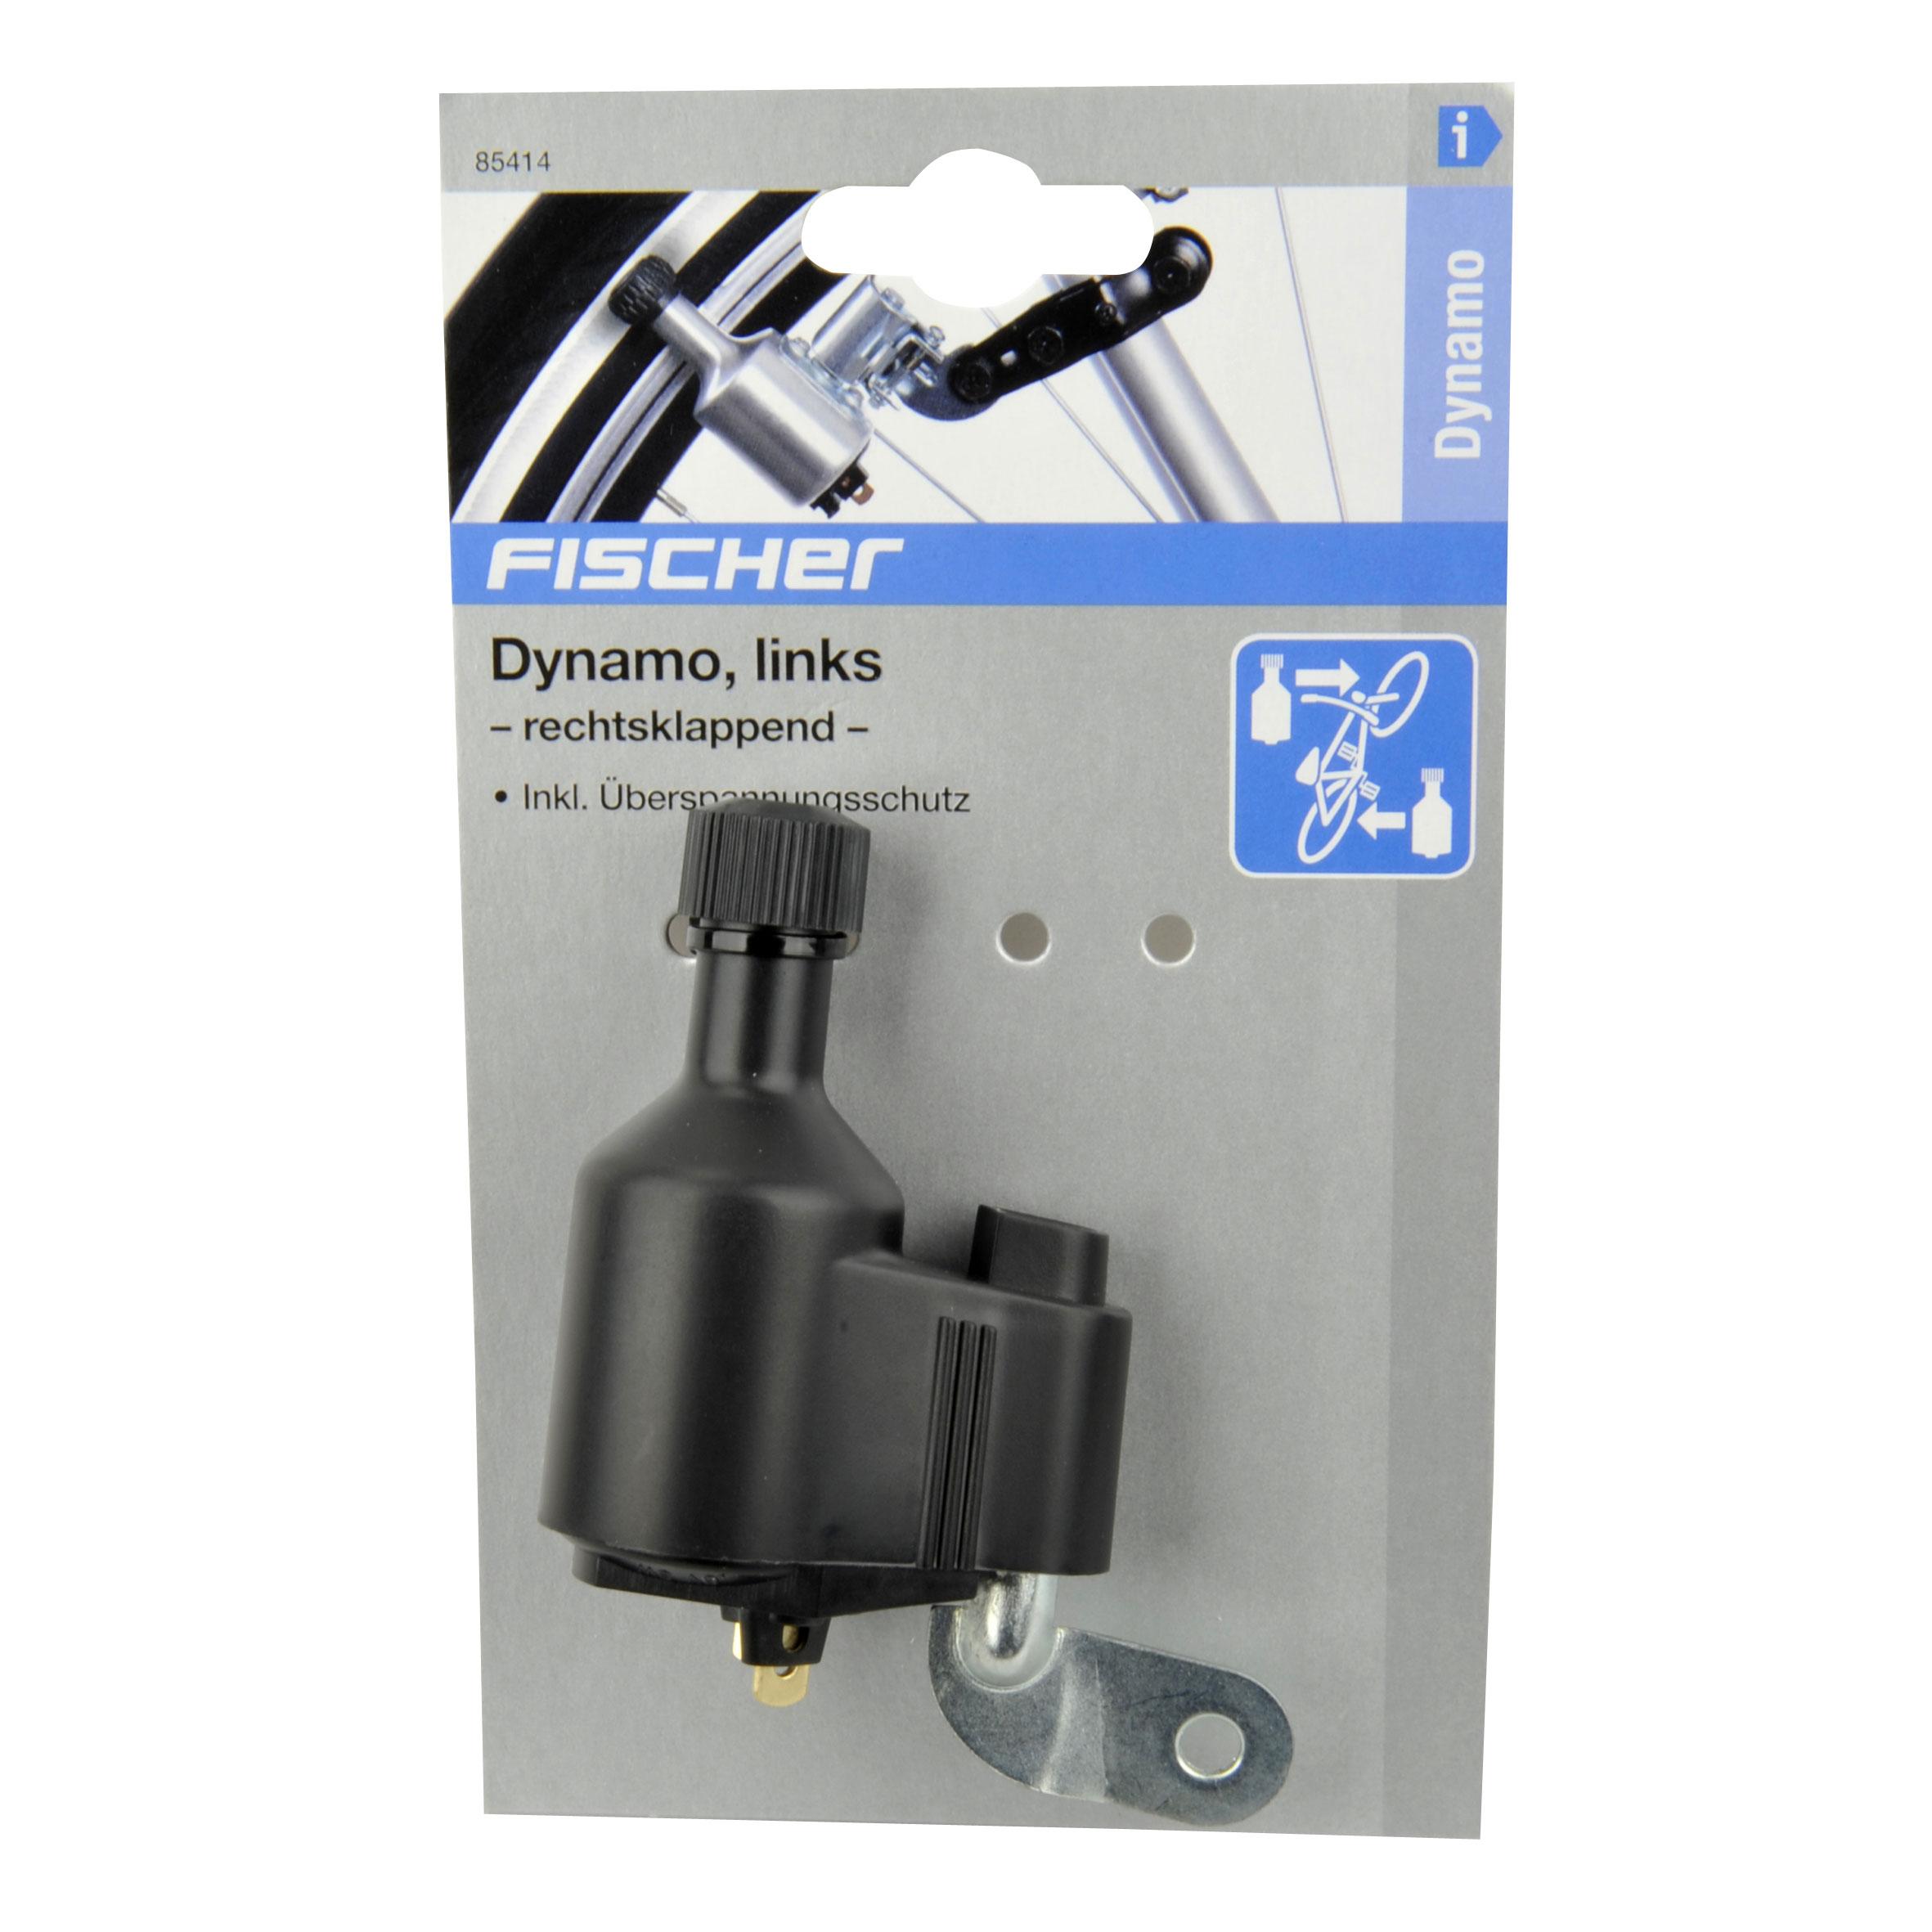 fischer fahrradbeleuchtung dynamo links 6 volt 3 watt bei. Black Bedroom Furniture Sets. Home Design Ideas